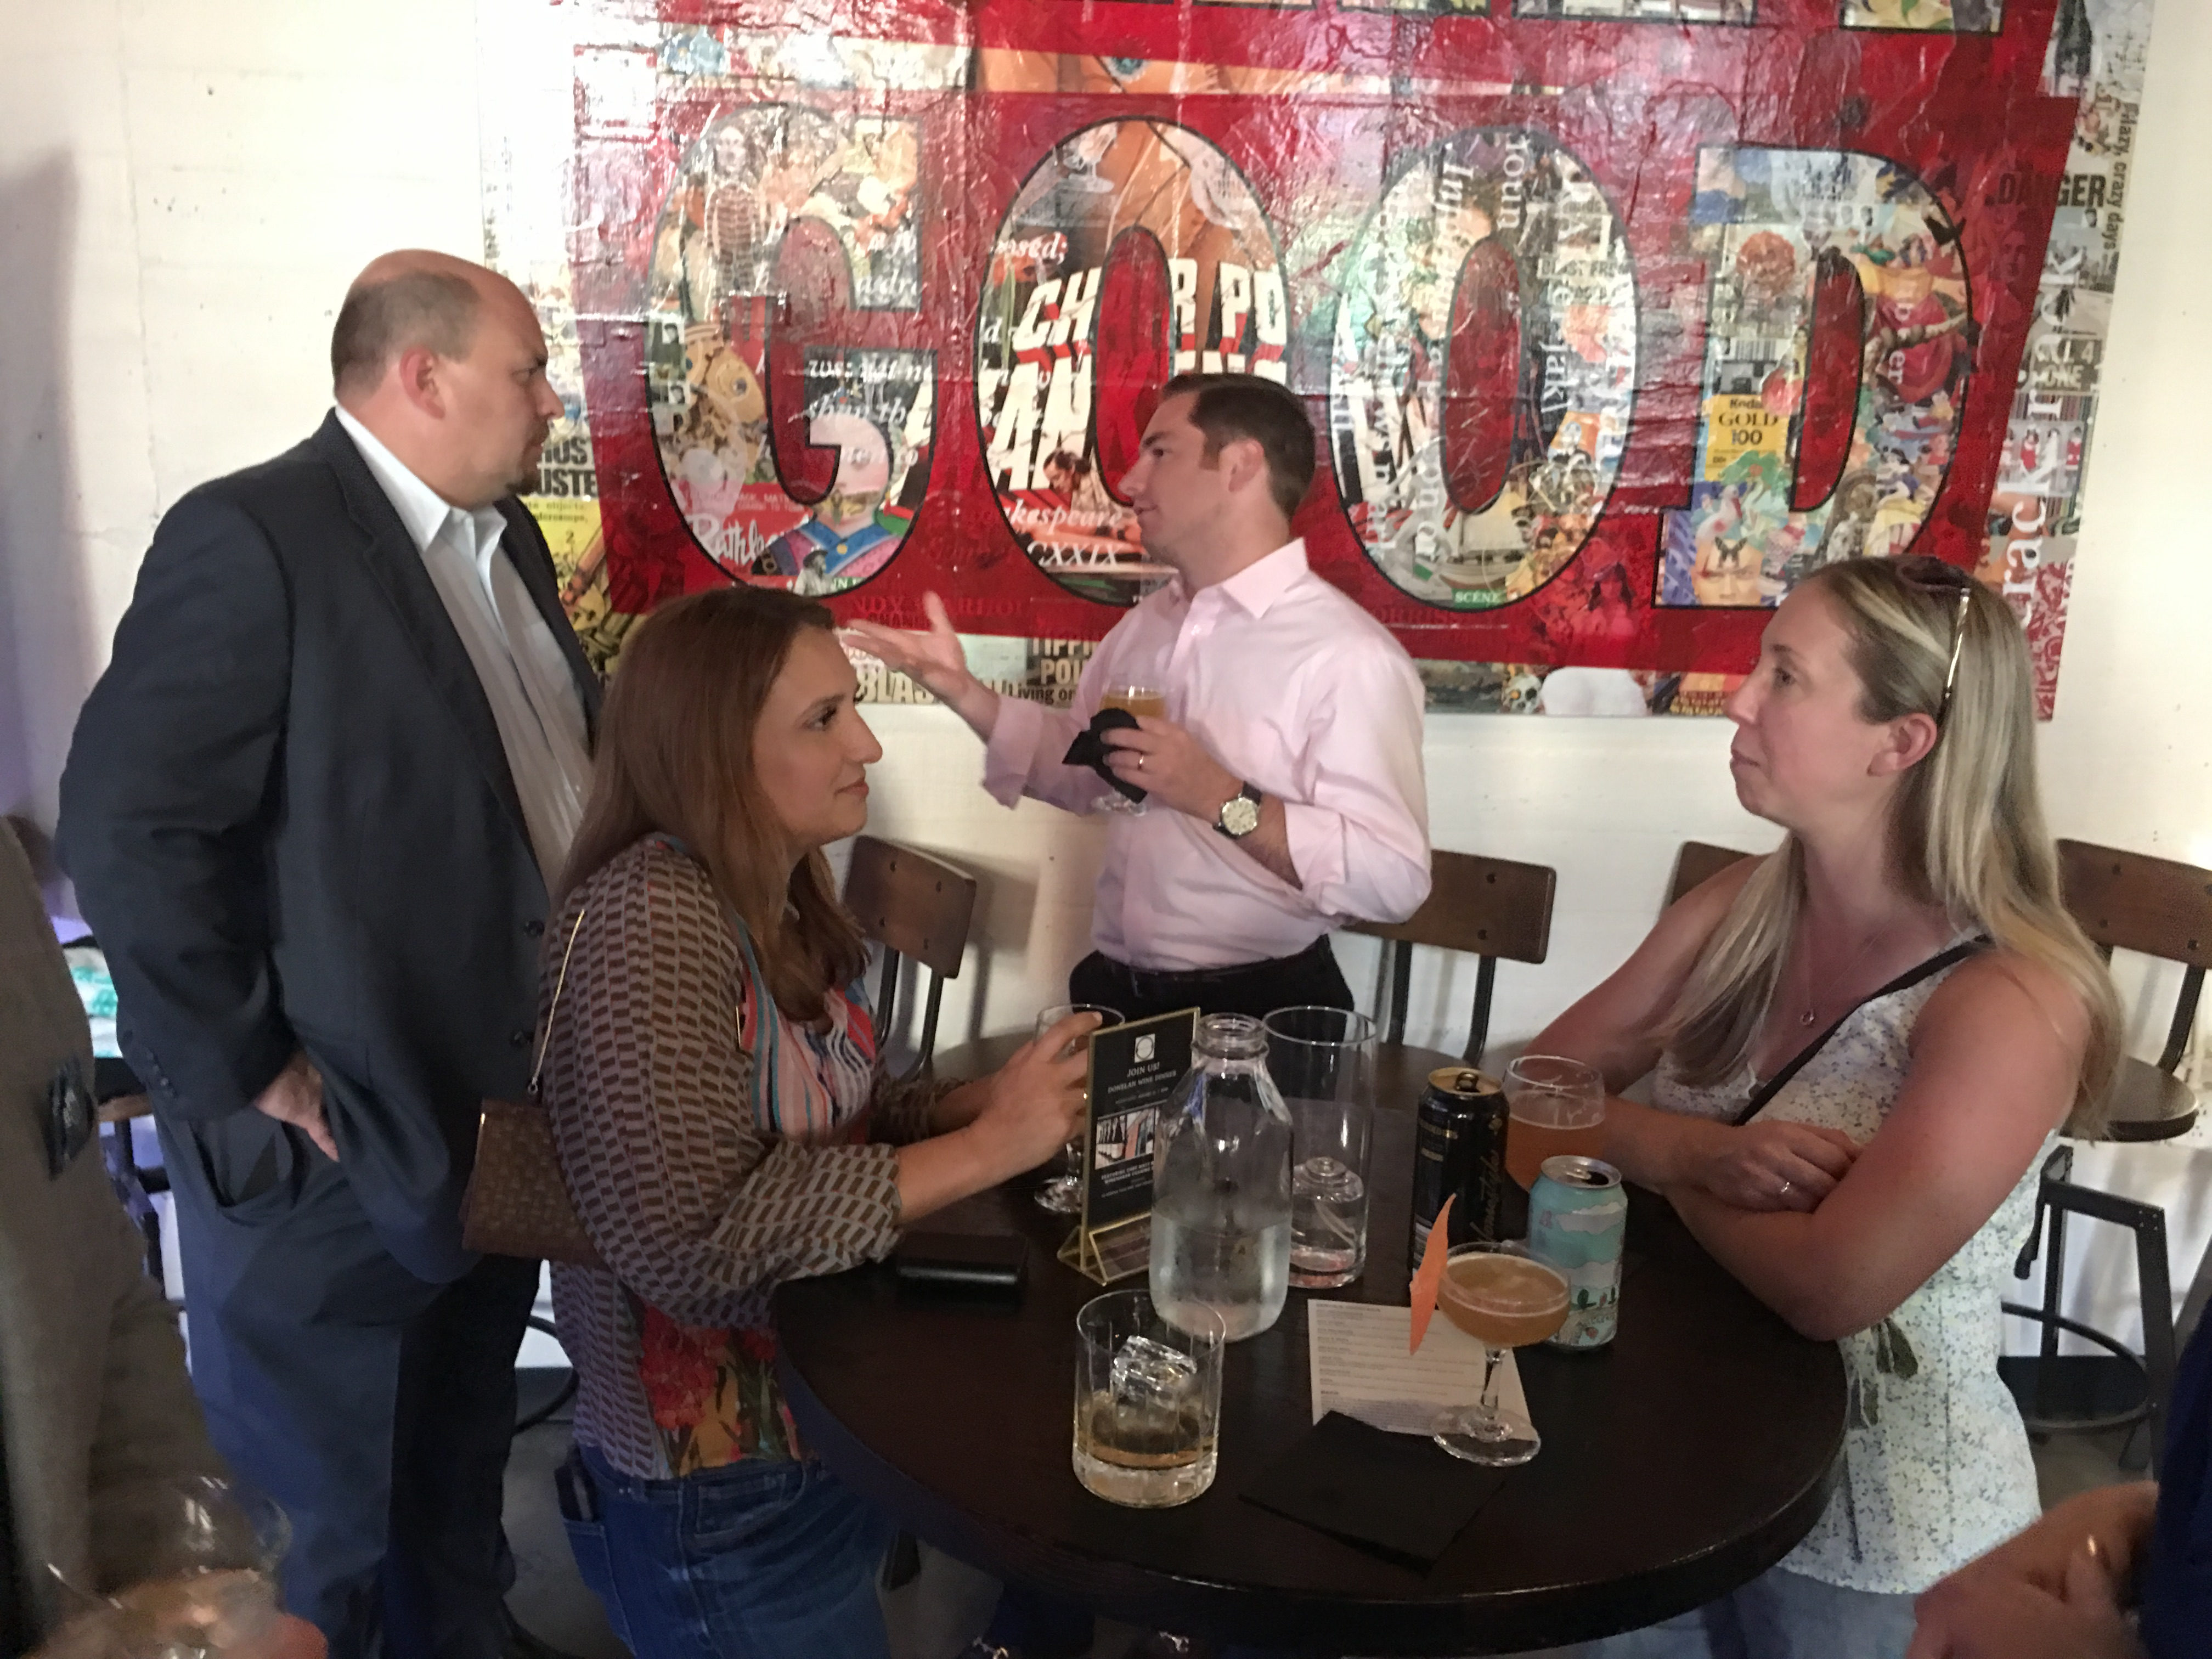 Nashville Social Mixer at 404 Kitchen - Casey McKeon